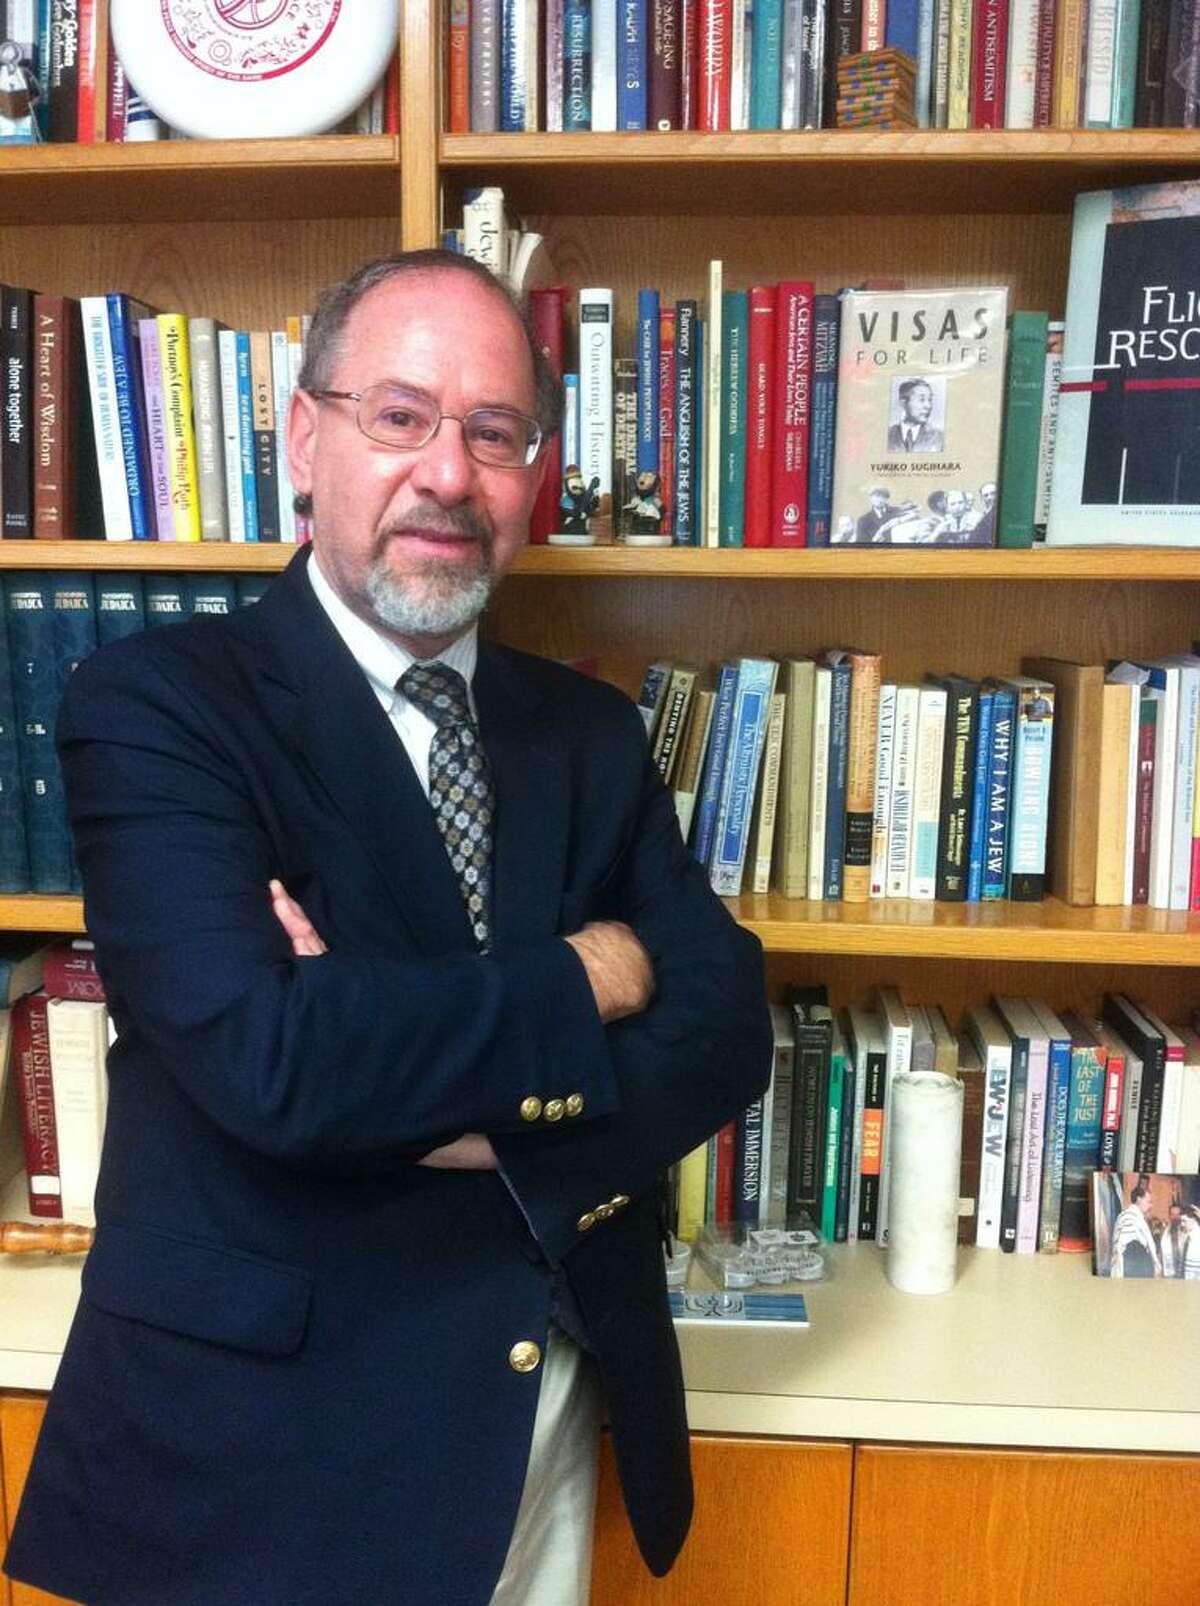 Rabbi Alvin Wainhaus of Congregation Or Shalom in Orange